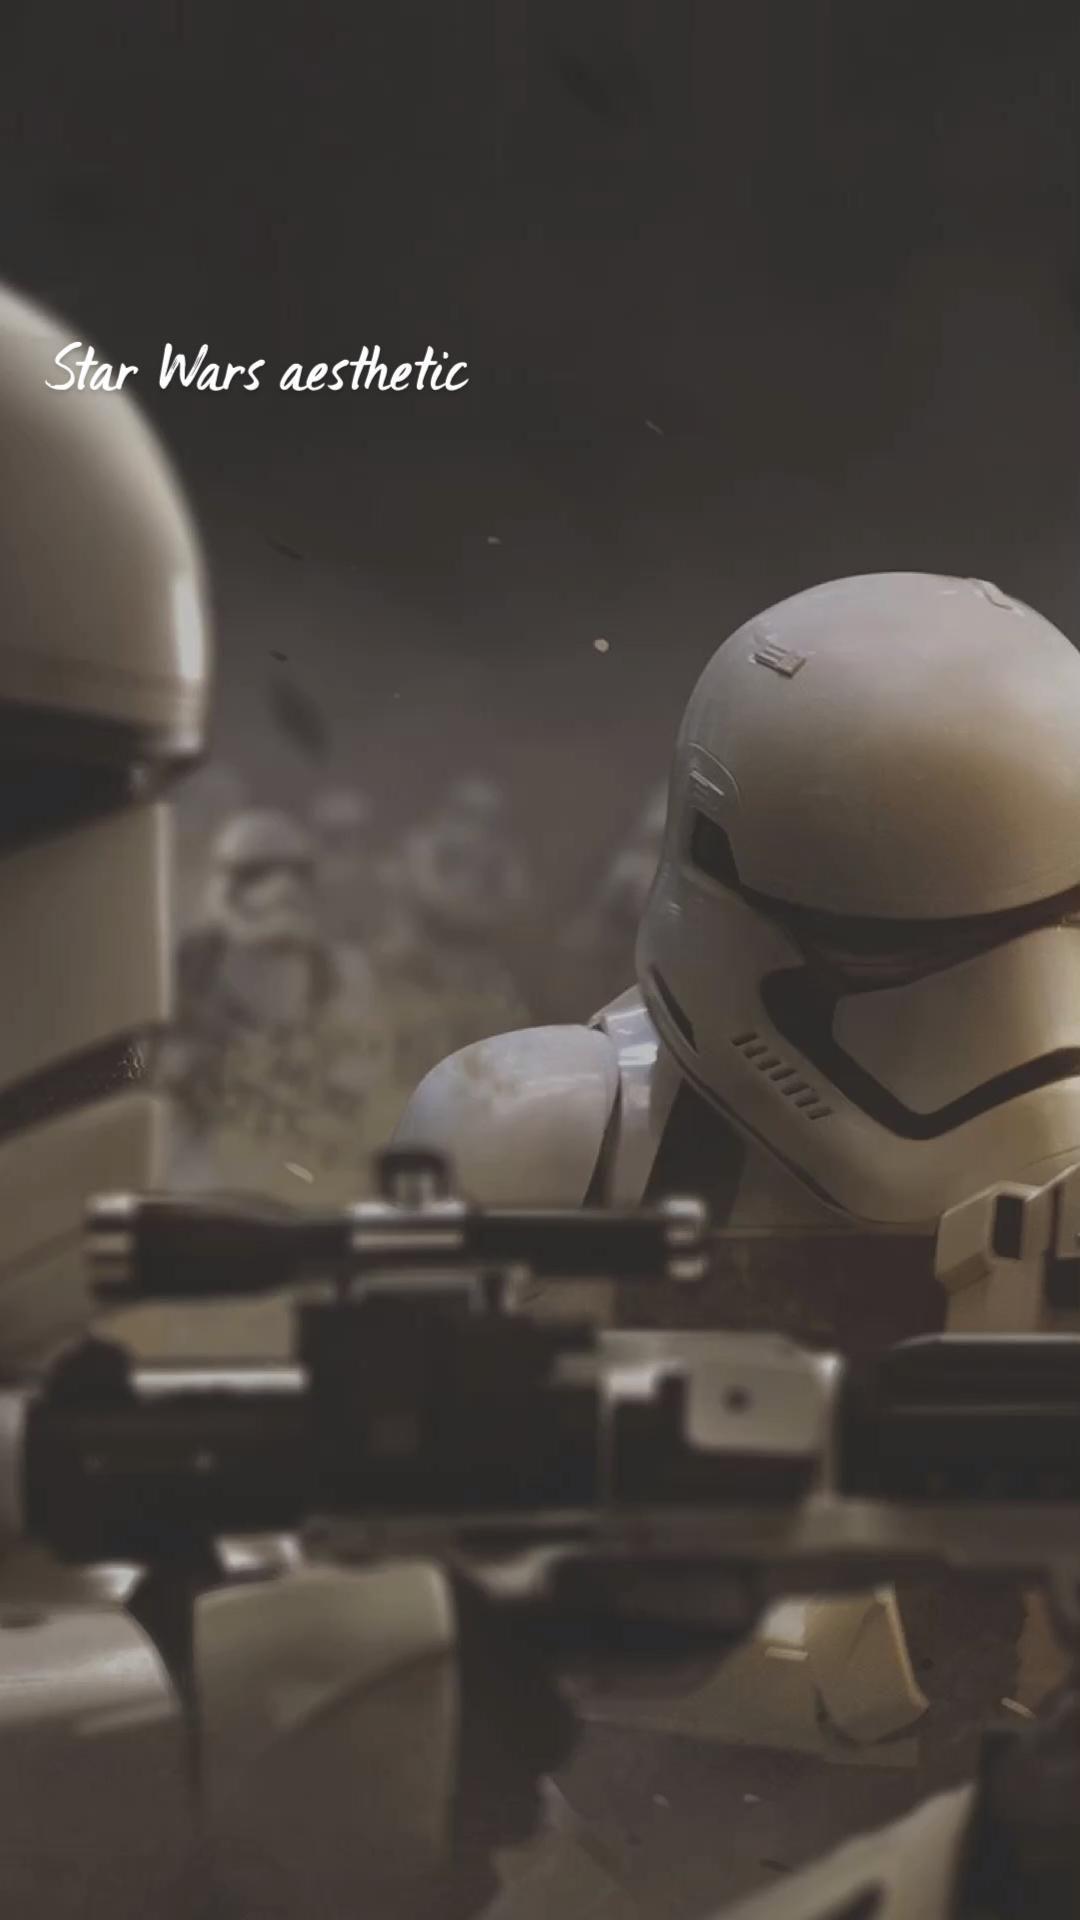 Star Wars aesthetic